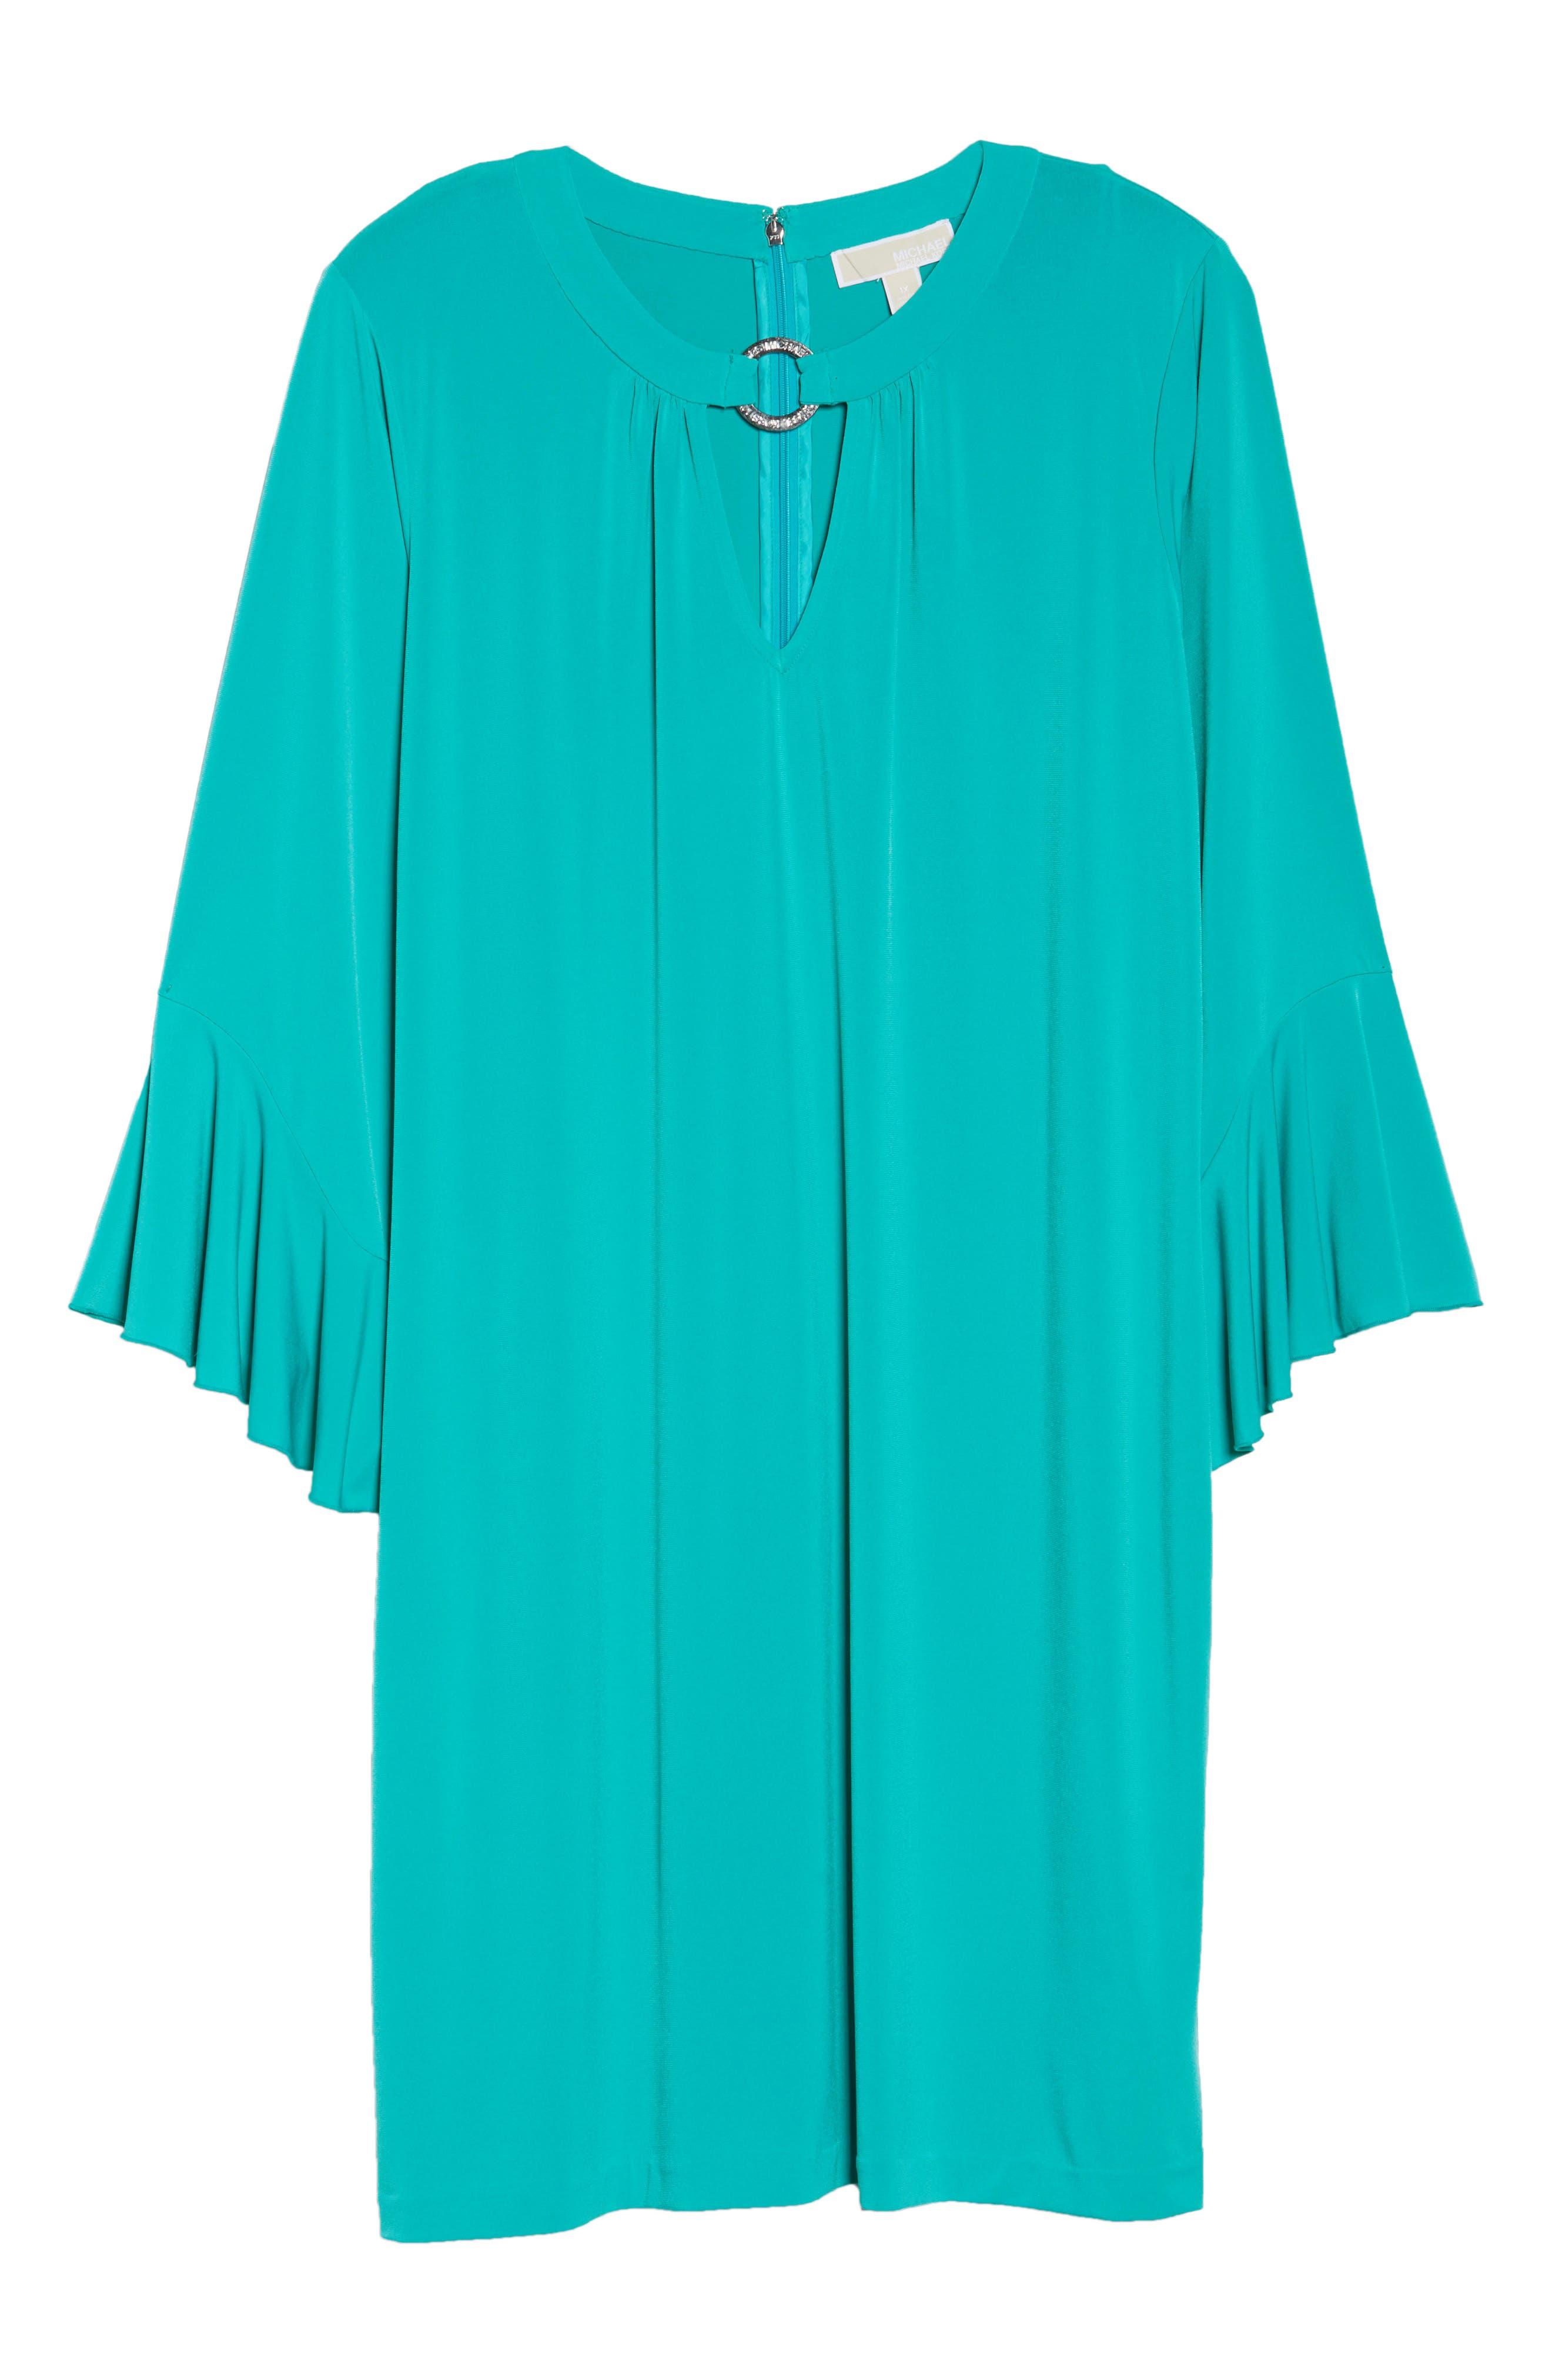 Ring Detail Shift Dress,                             Alternate thumbnail 6, color,                             Tile Blue